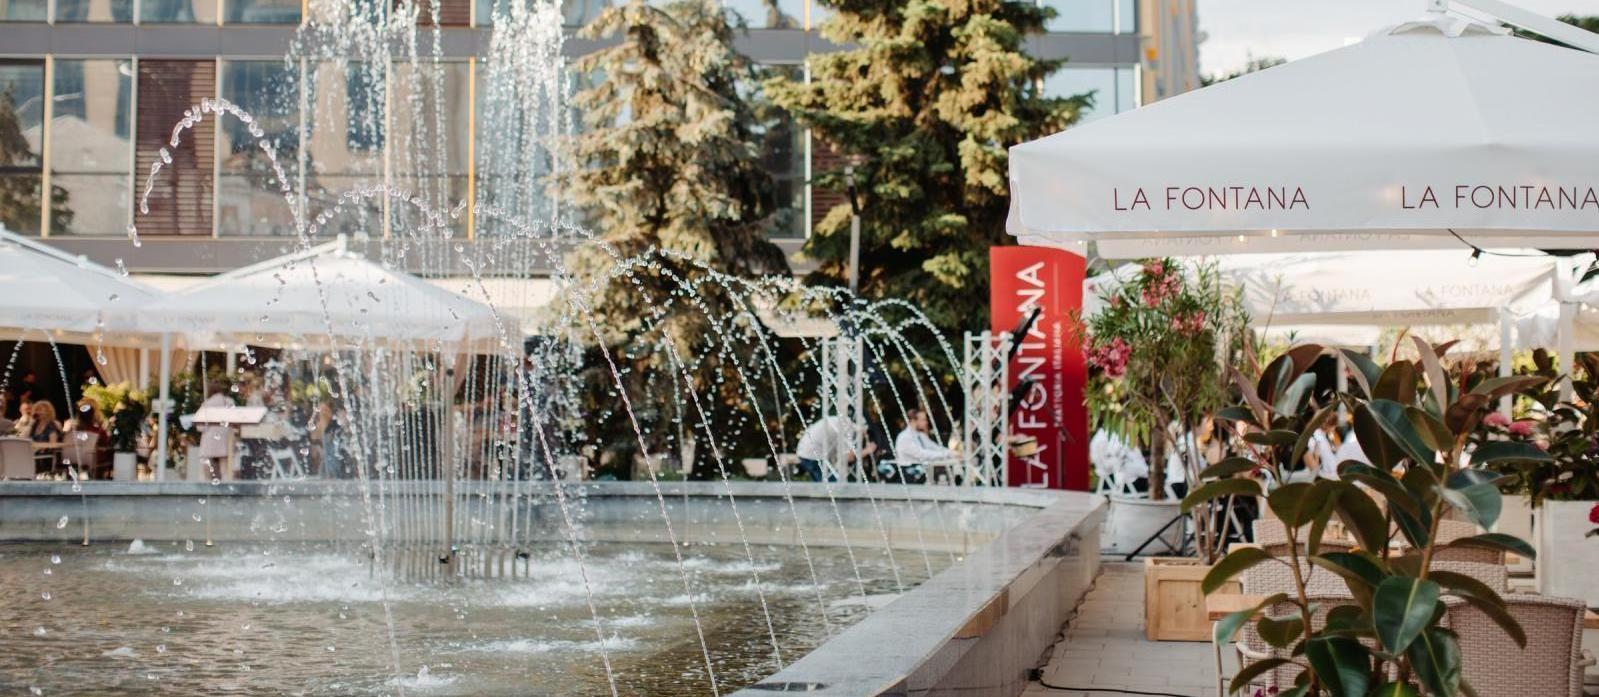 La Fontana trattoria